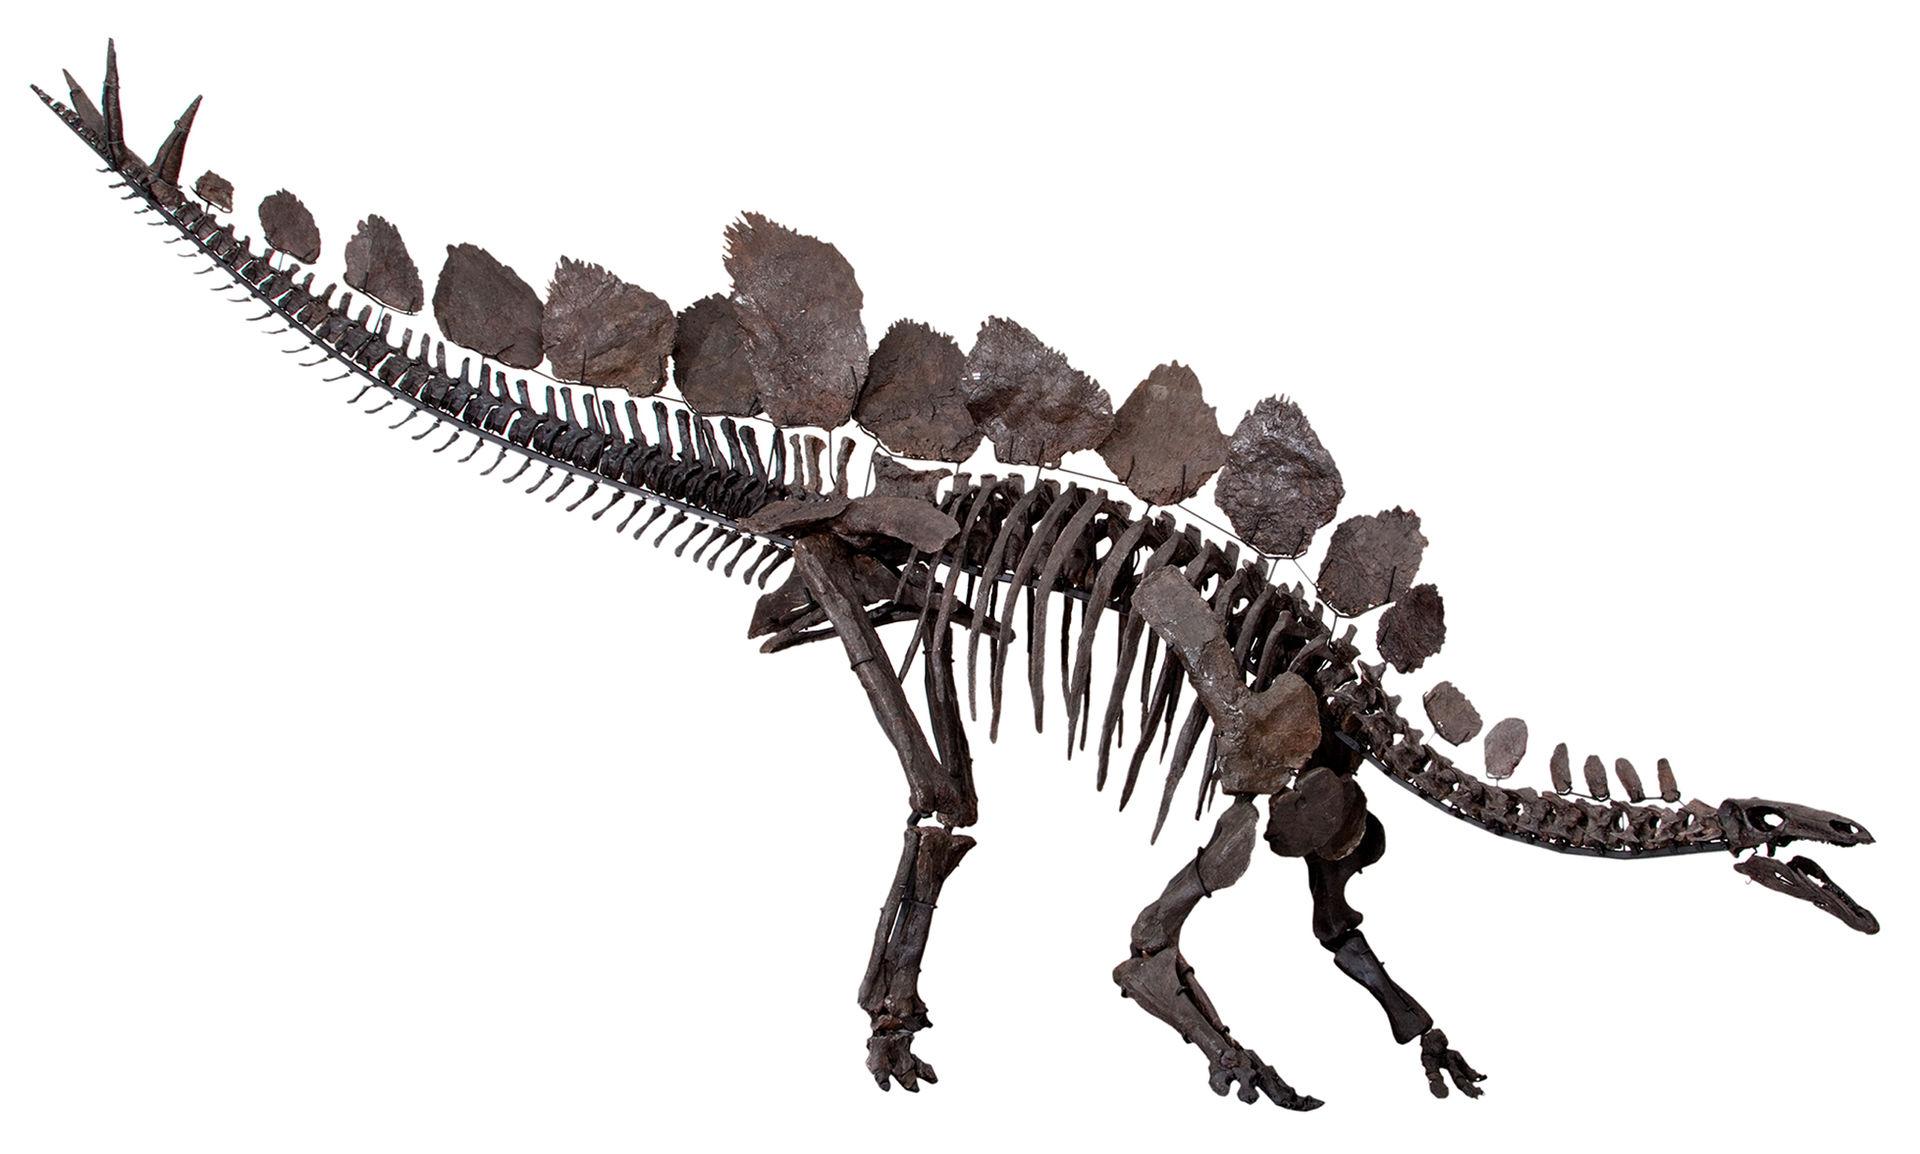 Stegosaurus Skeleton Natural History Museum